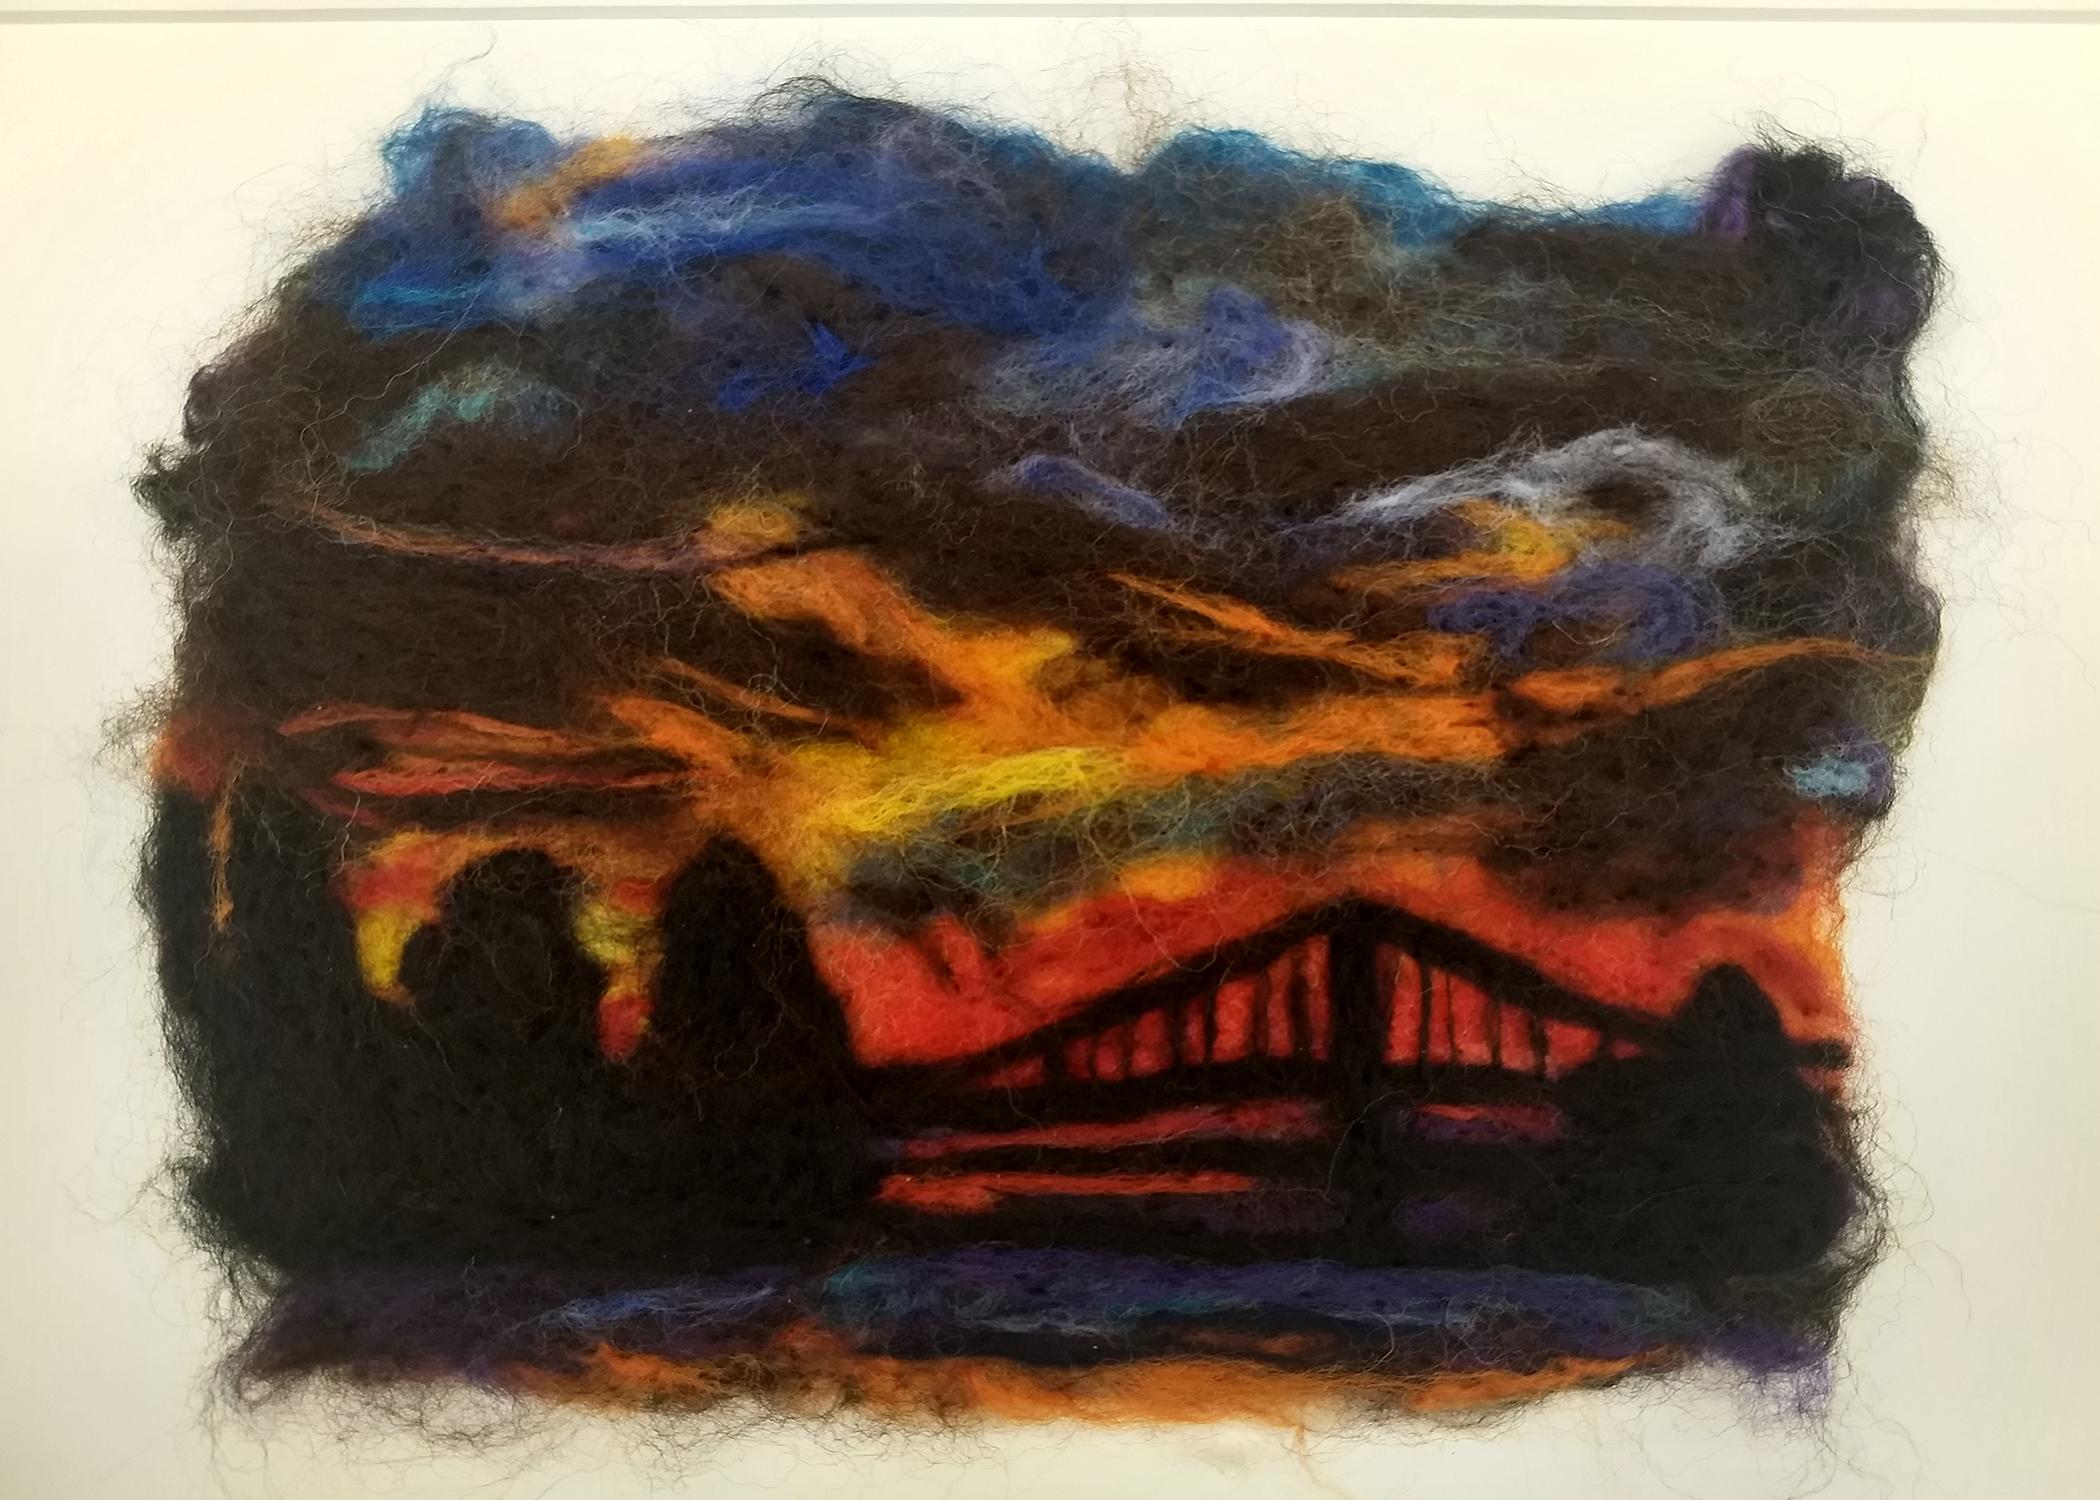 Visual Arts - Kettering City School District